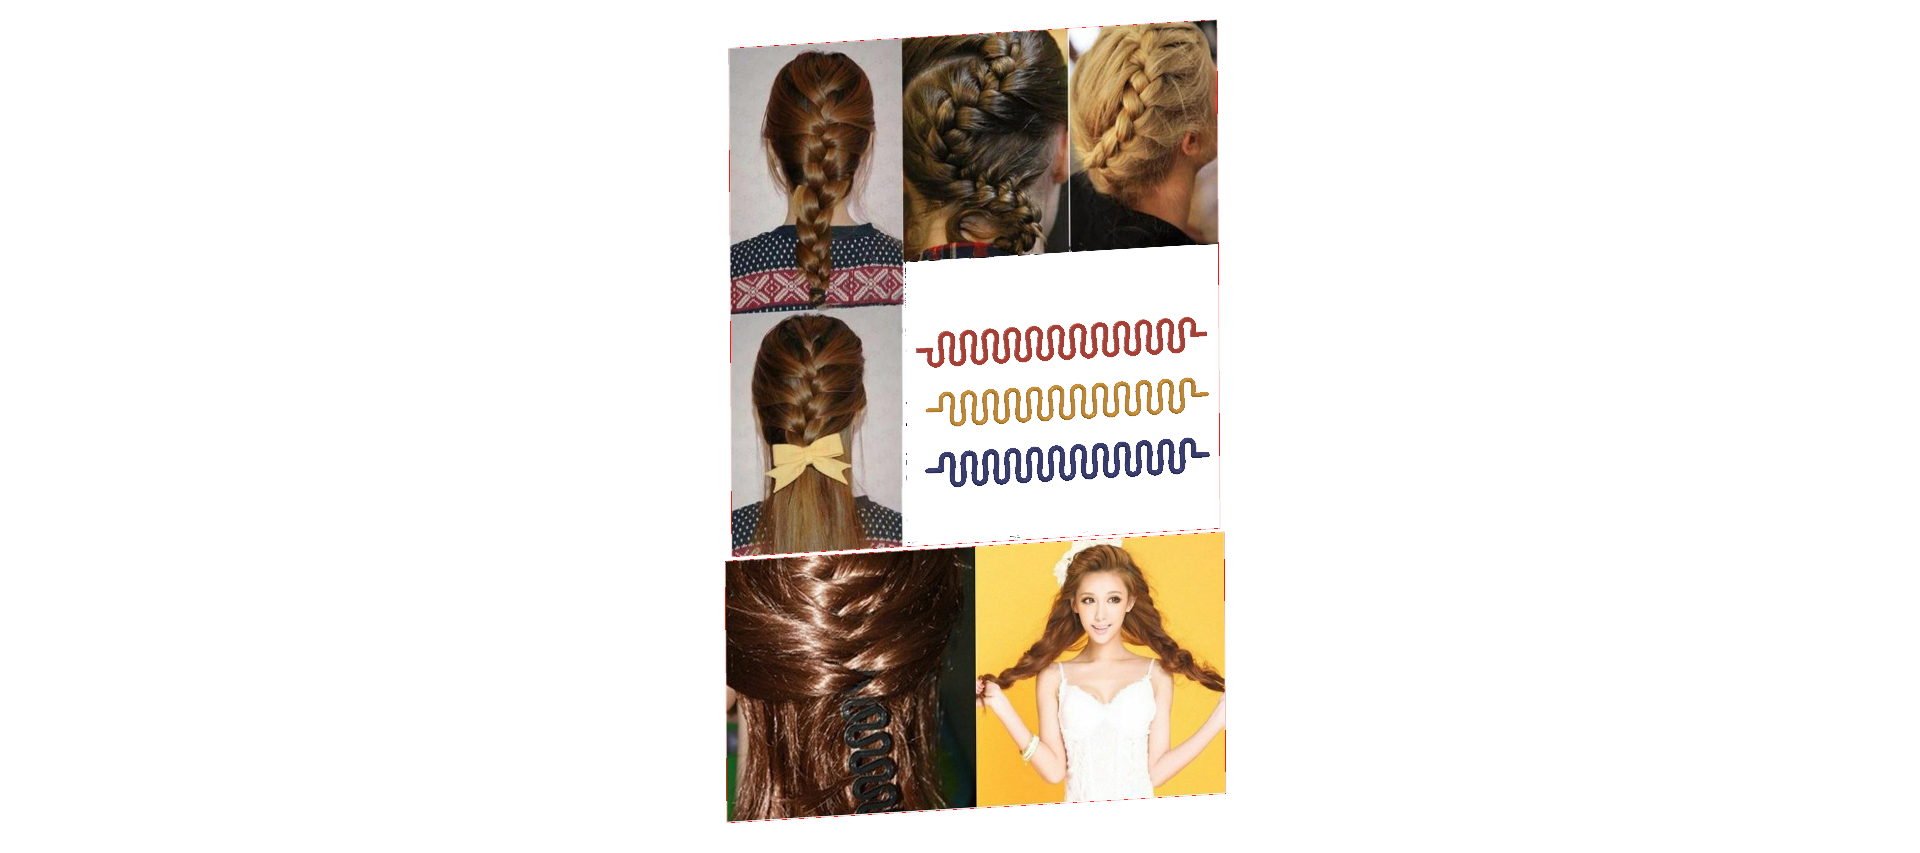 Female braid hair 04 v5-00.png Download STL file female hair braid hair styling roller hair accessories for girl headdress weaving tool 3d print cnc • 3D printing object, Dzusto